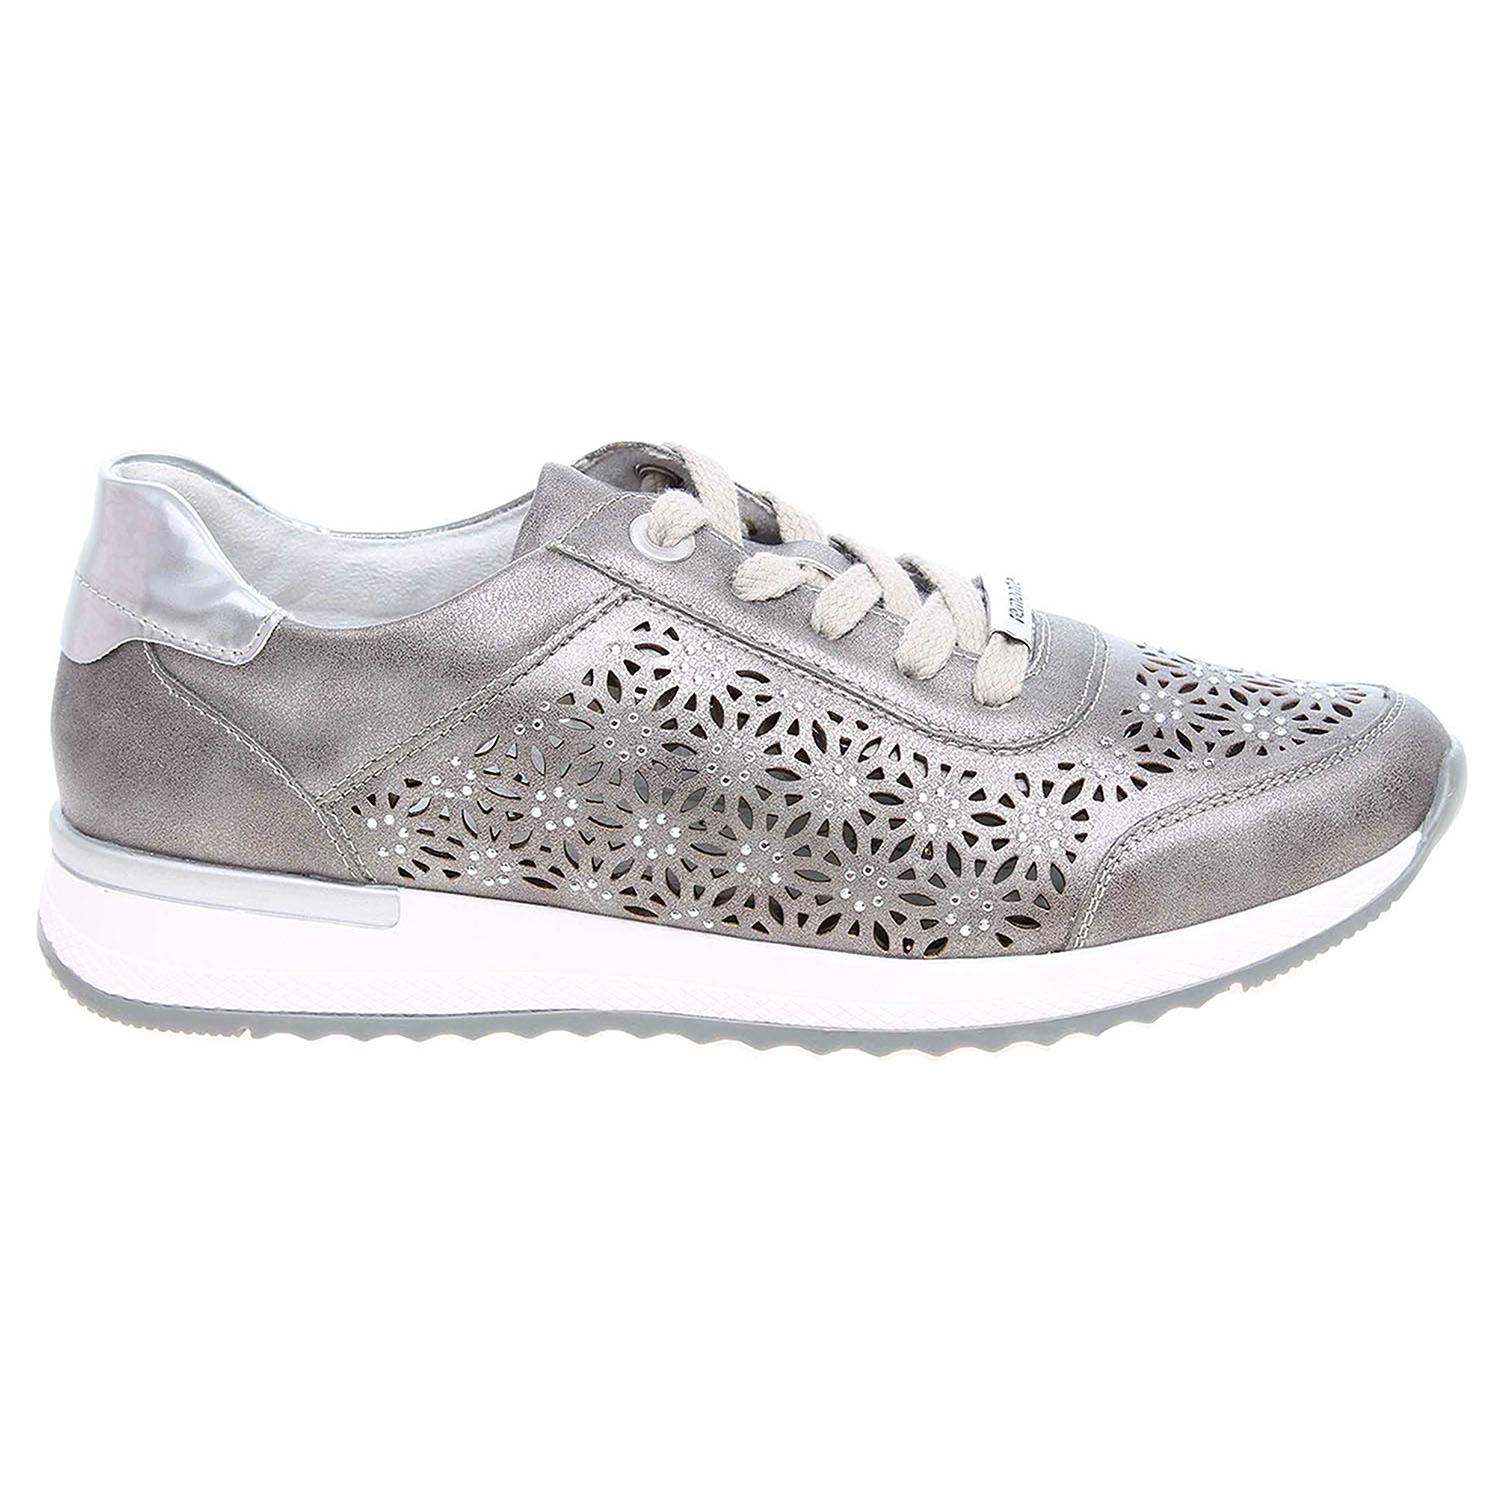 Remonte dámská obuv R7004-90 stříbrná 42